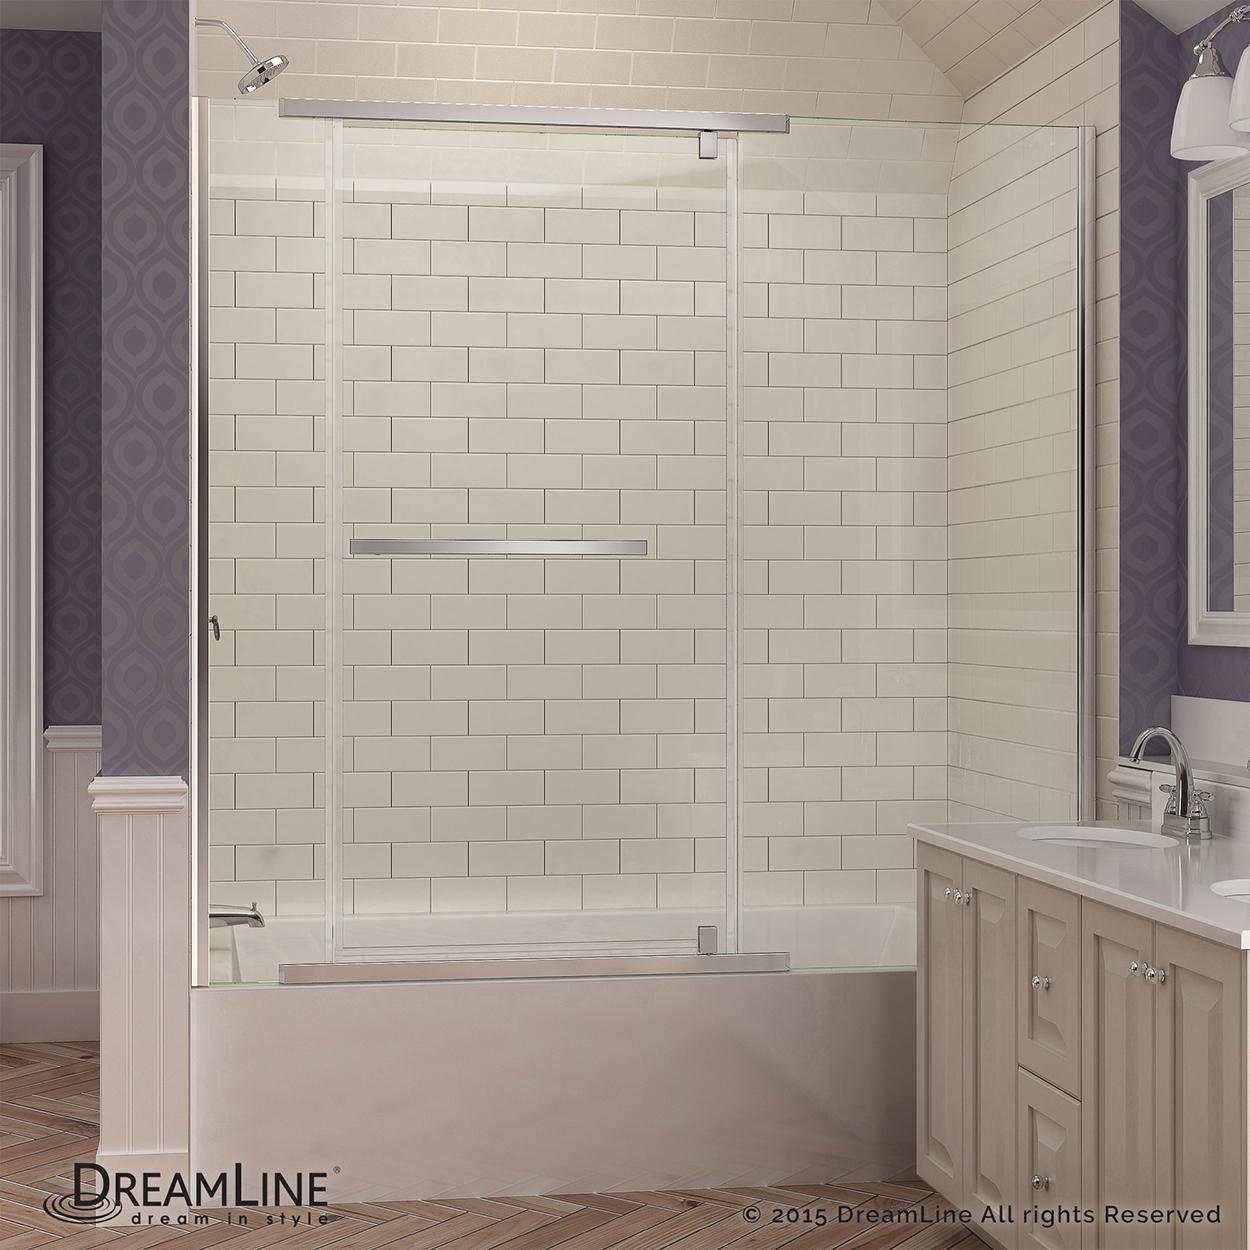 Bath4All - DreamLine SHDR-2158580-01 Vitreo-X 58 to 58-3/4\